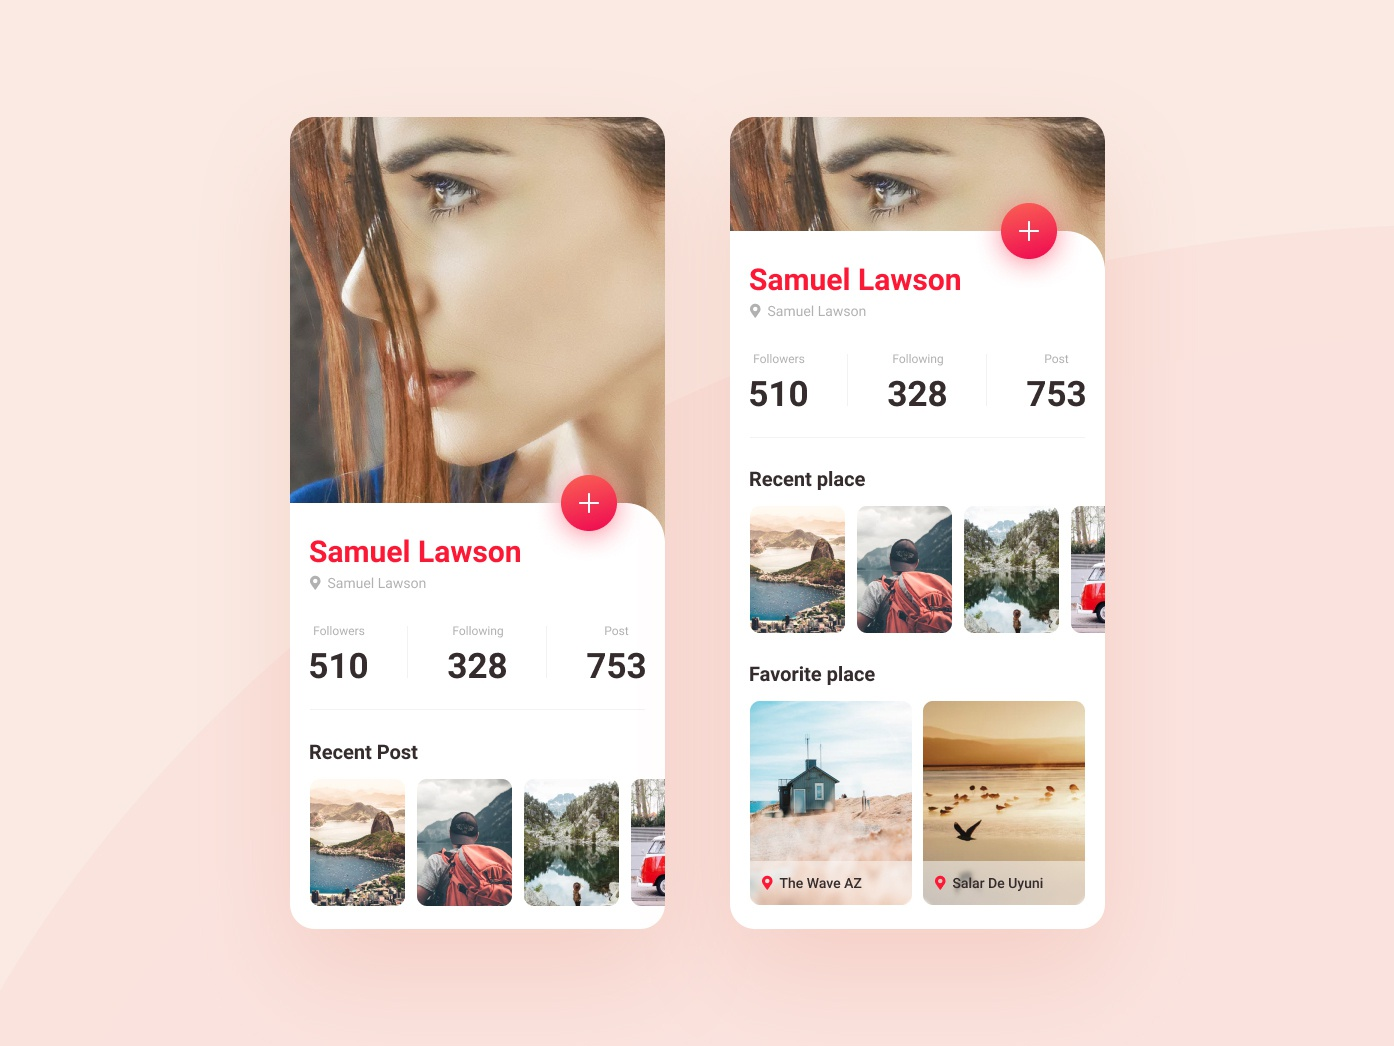 Daly Ui 006 | Profile location address travel ux ui mobile app design app application clean profile 006 daily ui figma